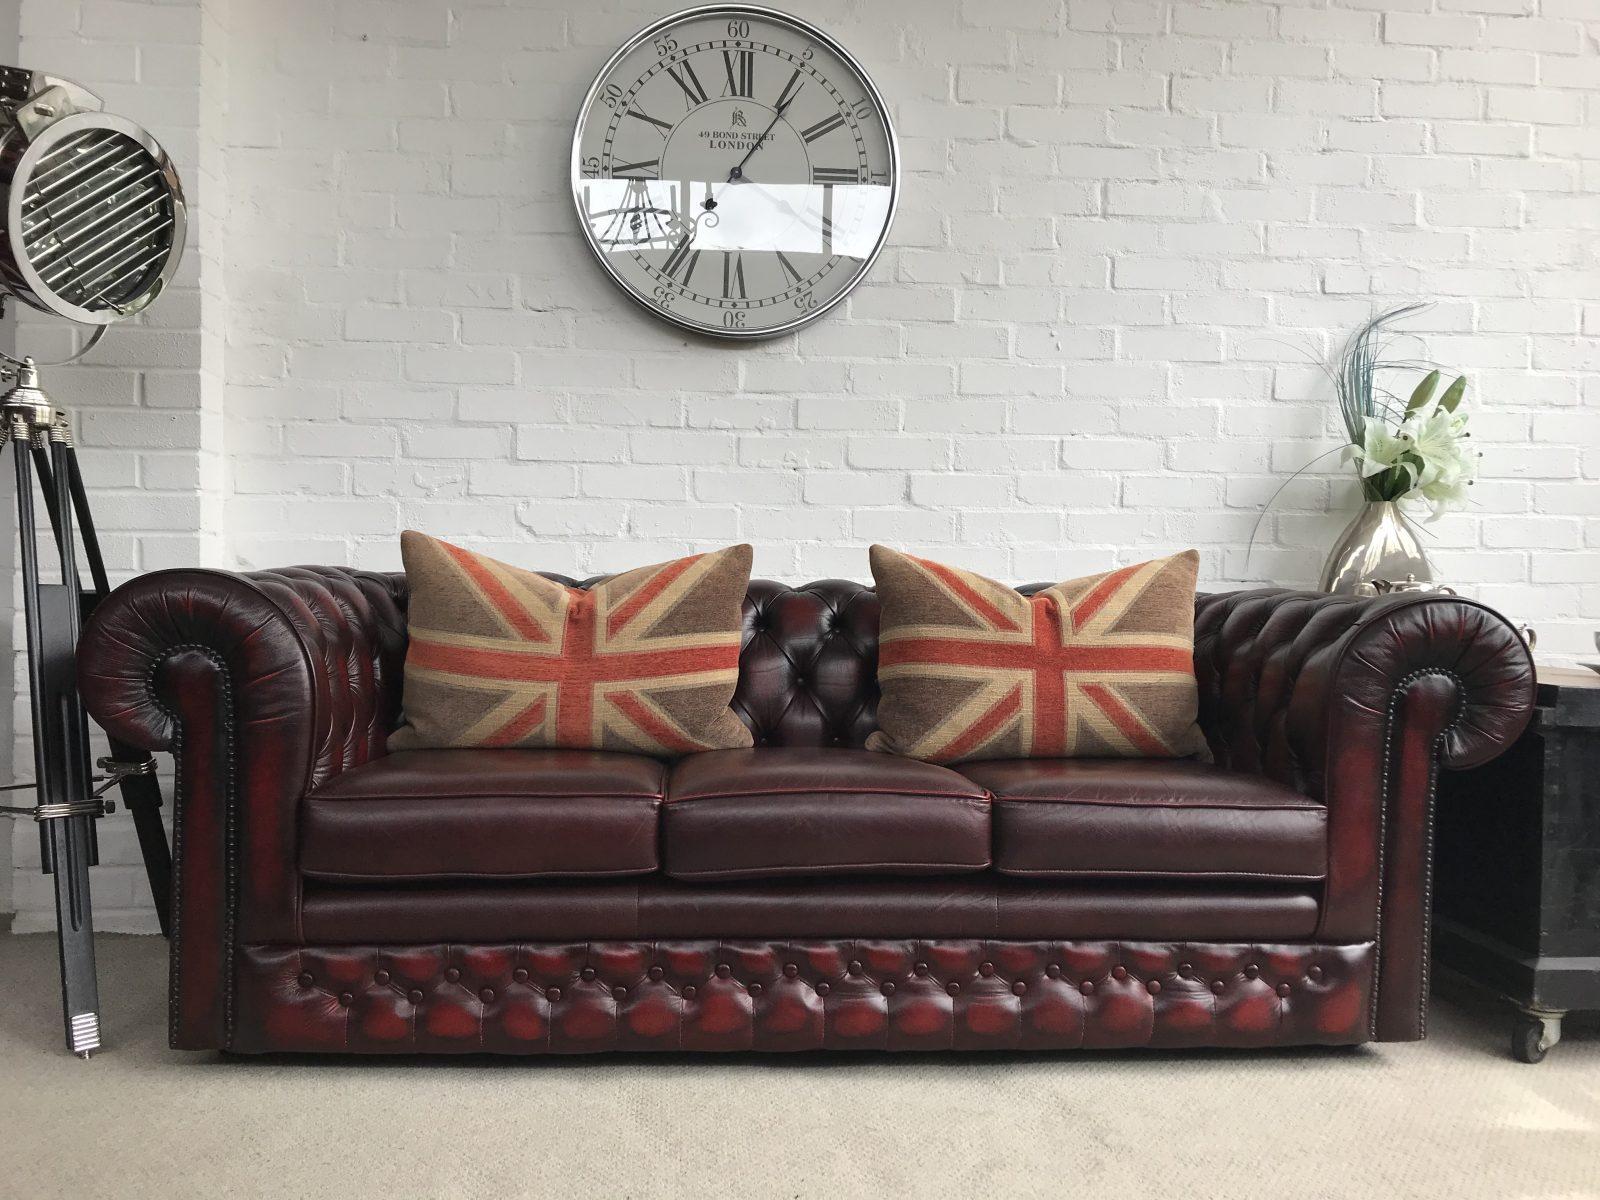 Thomas Lloyd Chesterfield Sofa…..SOLD.